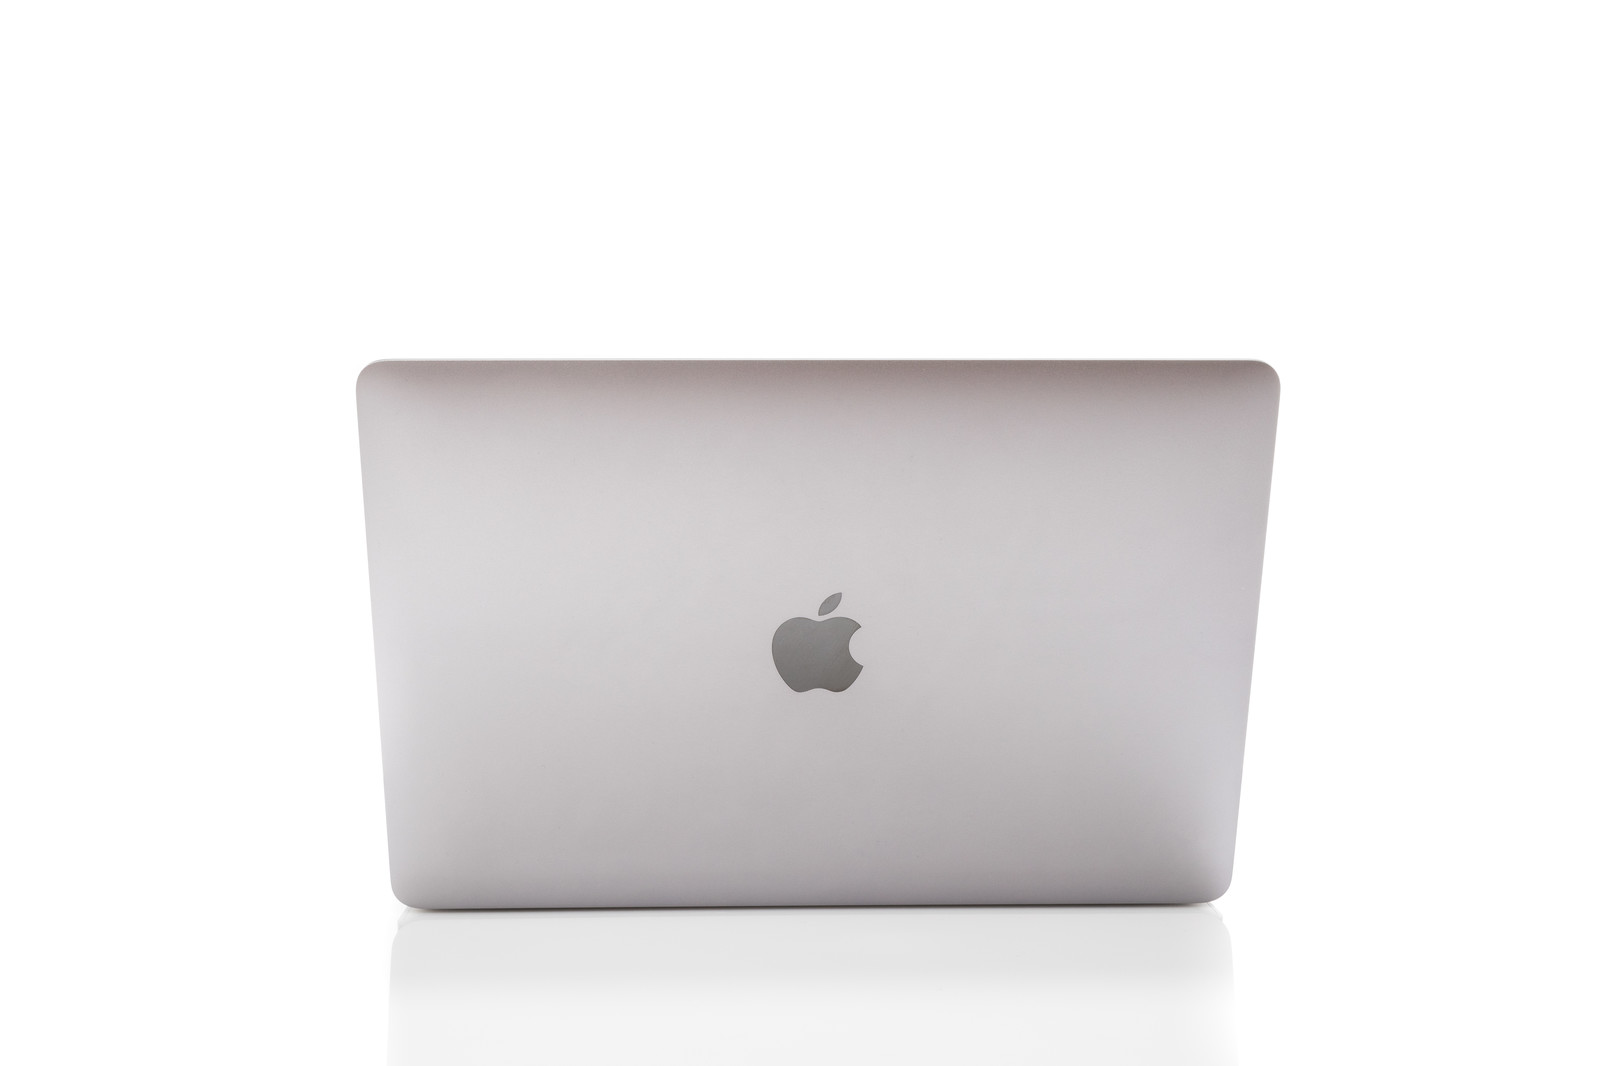 「Macbookの背面」の写真